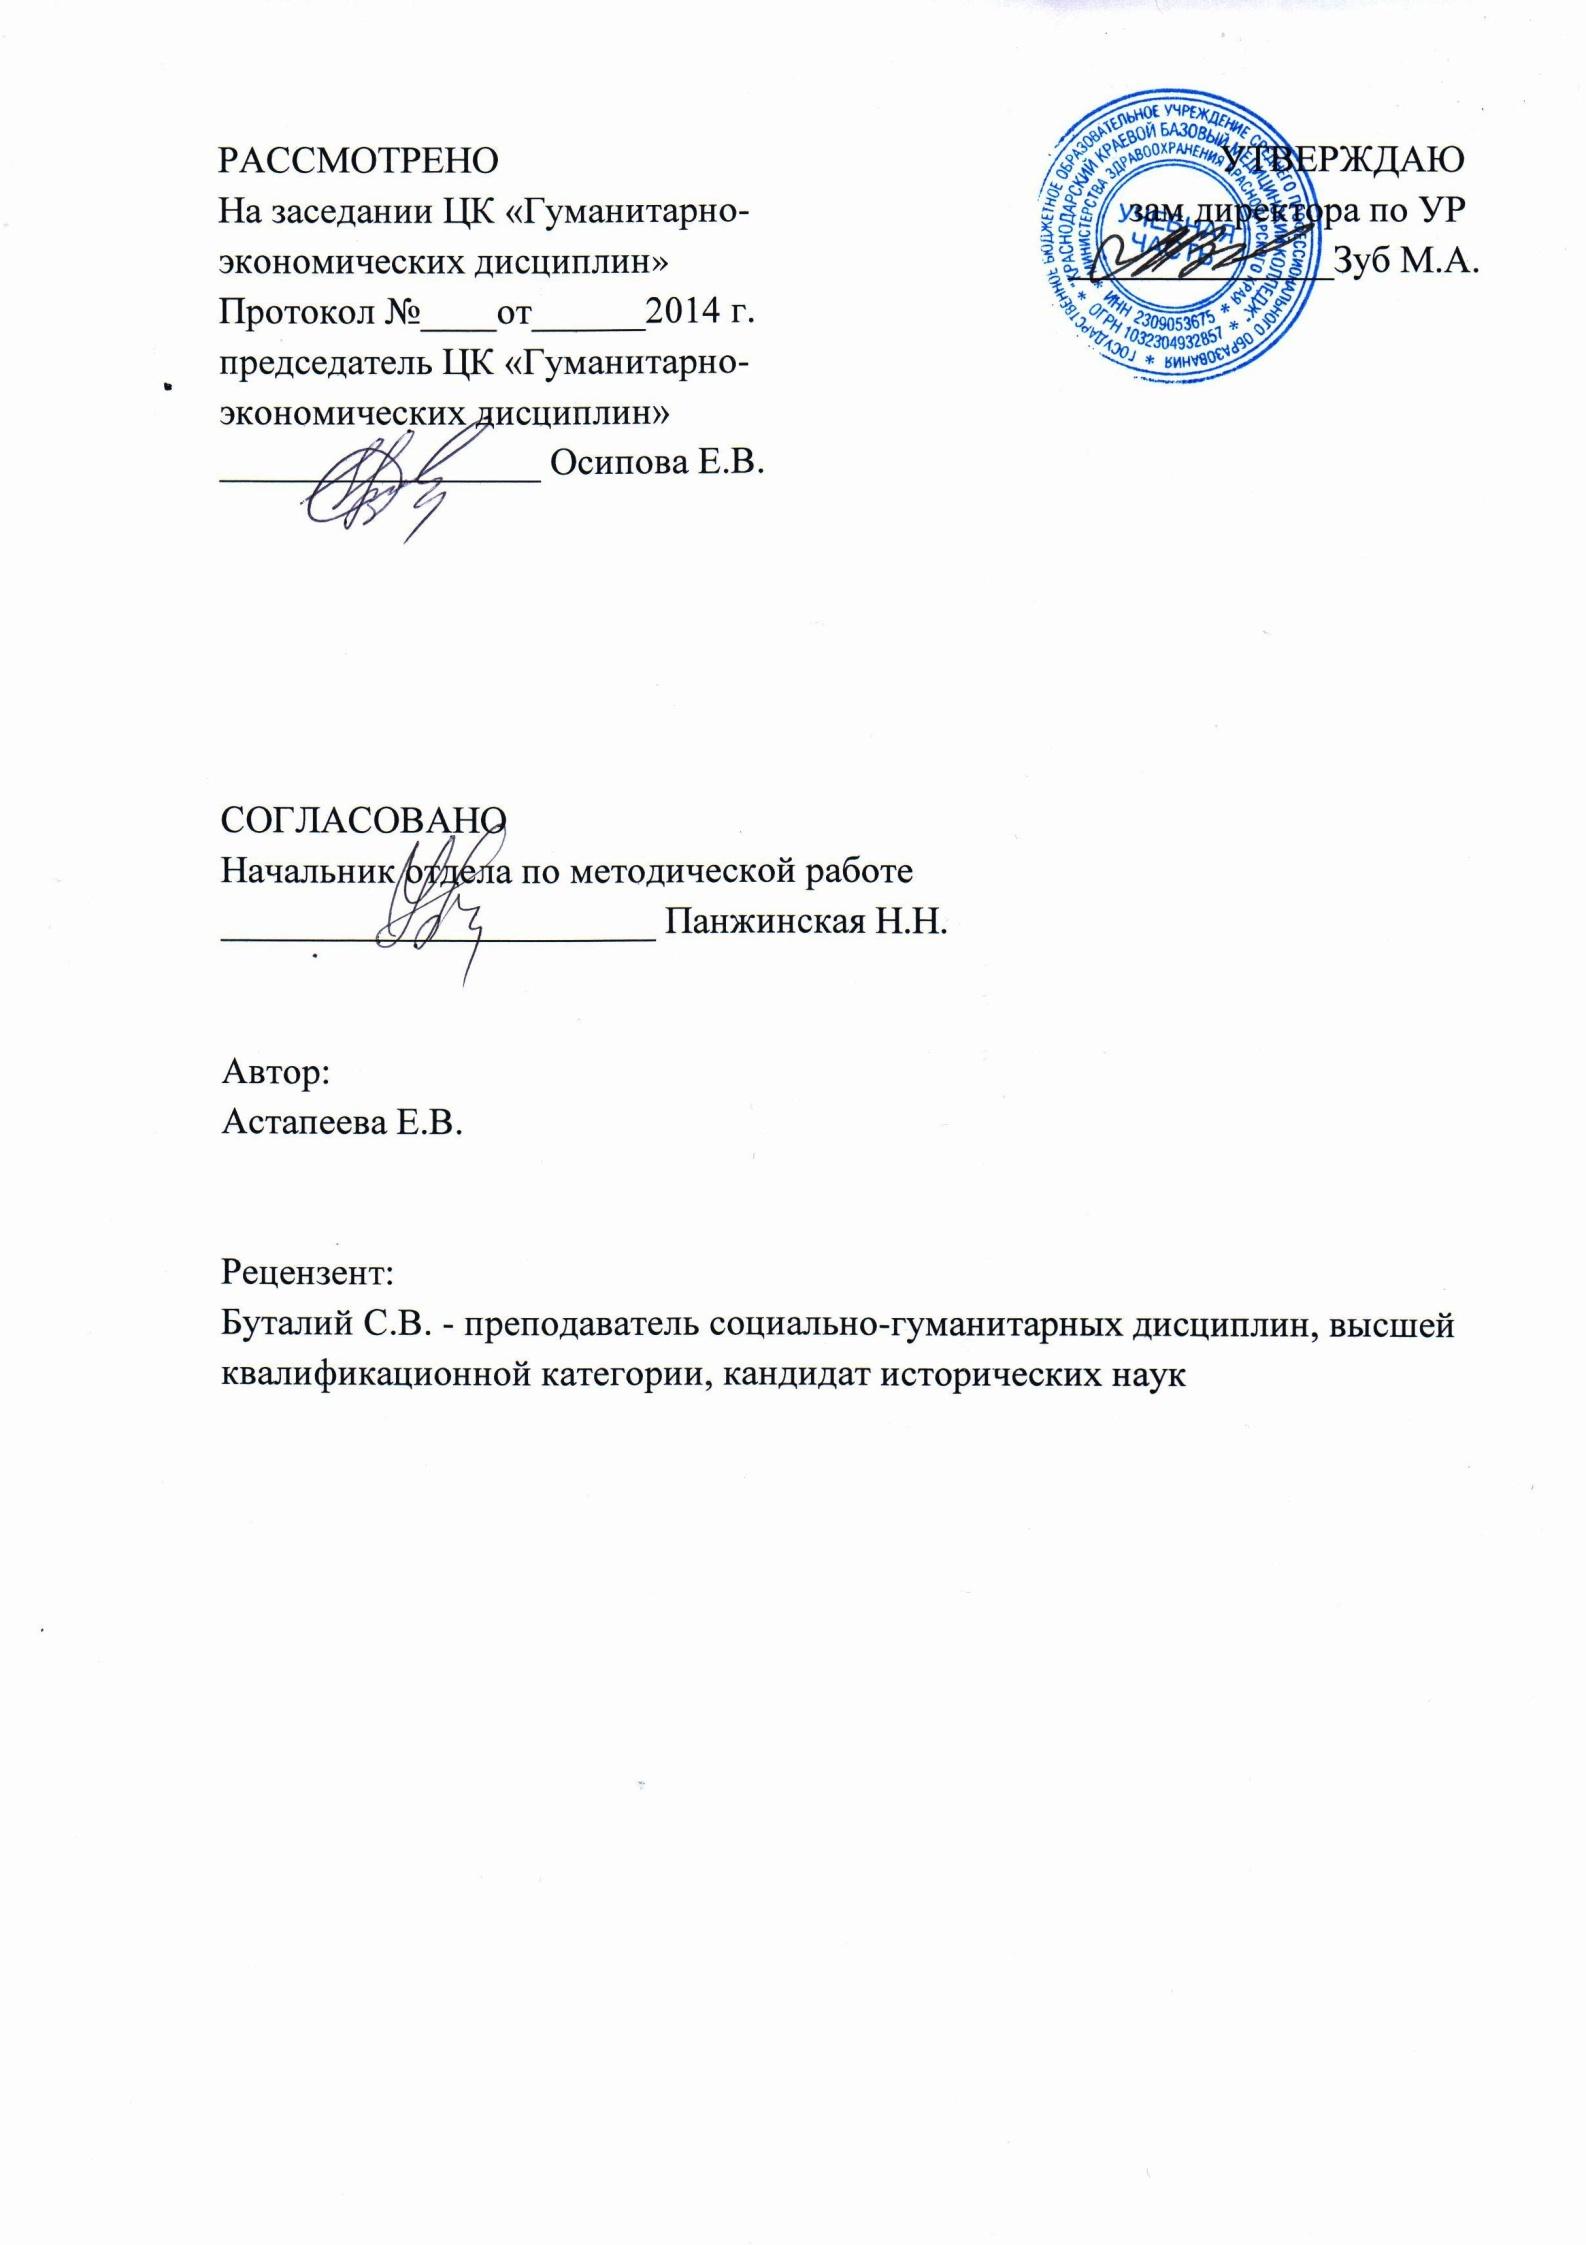 H:\Documents and Settings\Преподаватель\Мои документы\Panasonic\MFS\Scan\20150324_194544.jpg